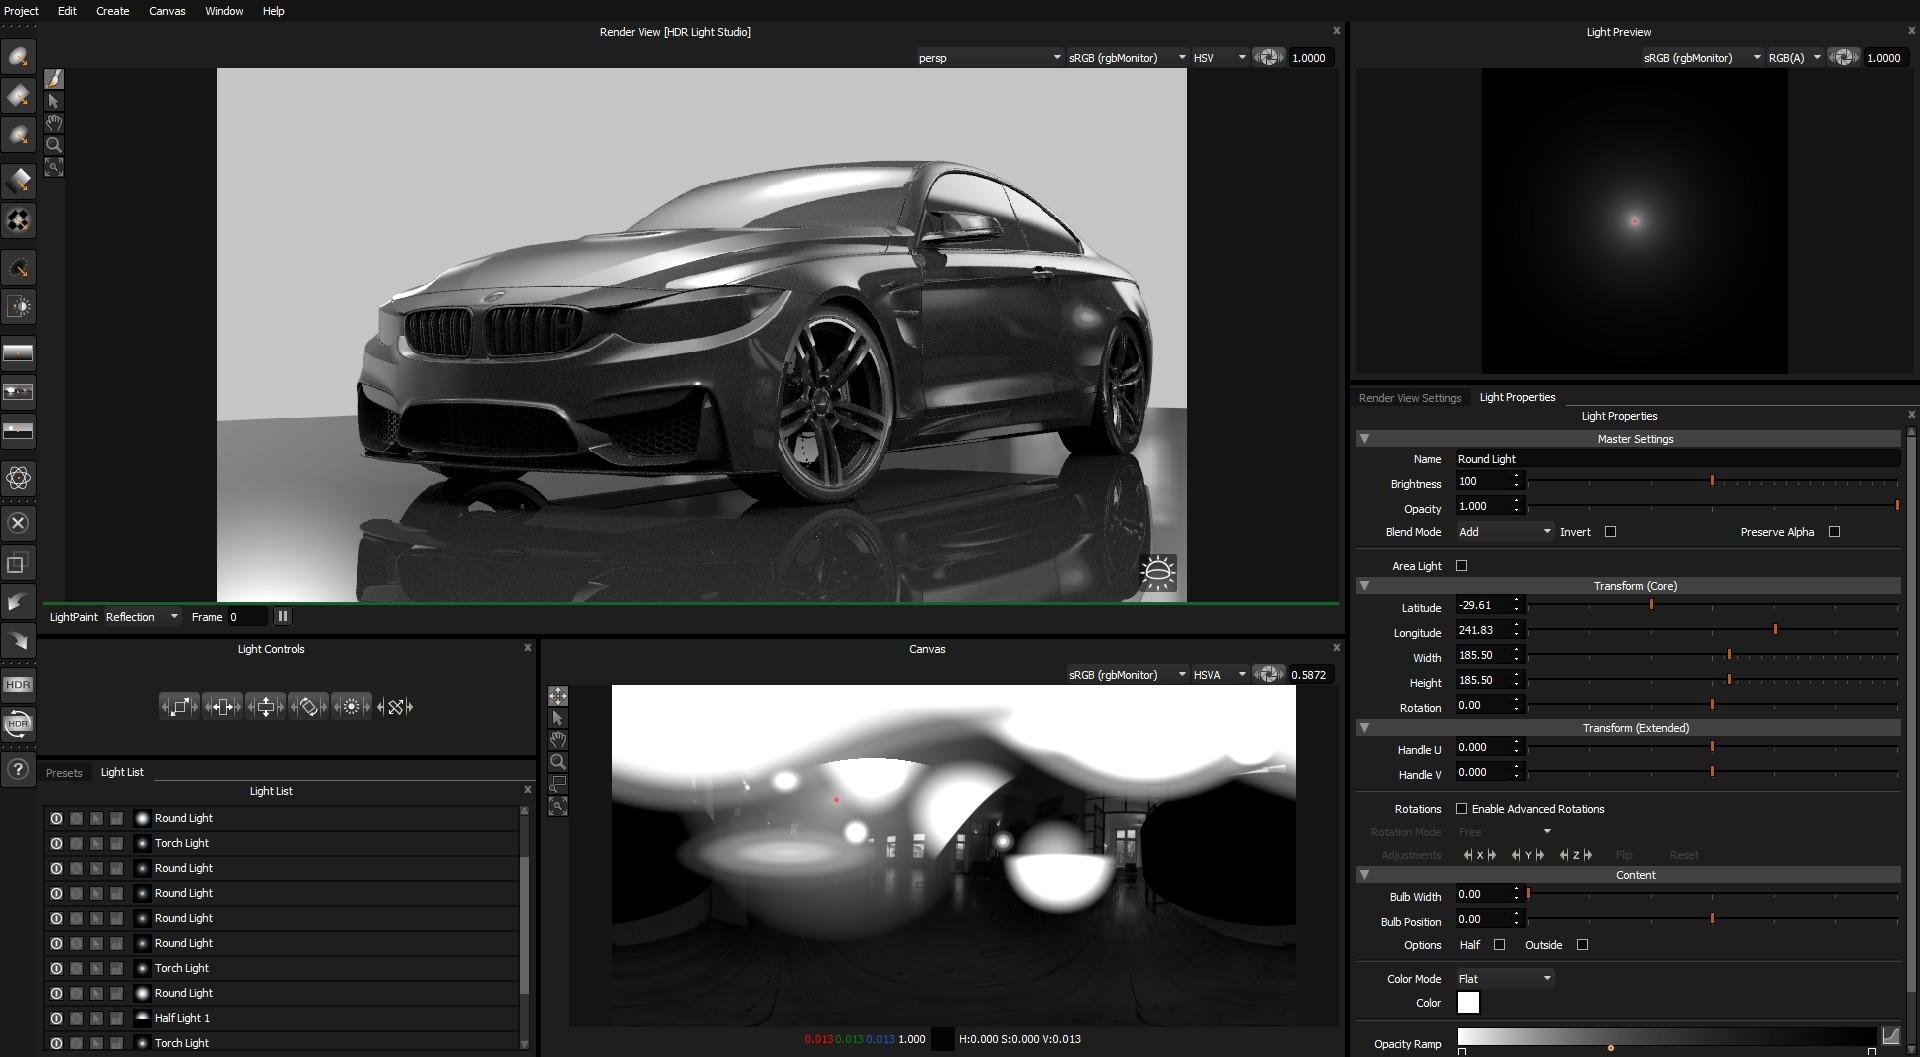 Lightmap HDR Light Studio - Standalone (node-locked, permanent license) - additional image 2